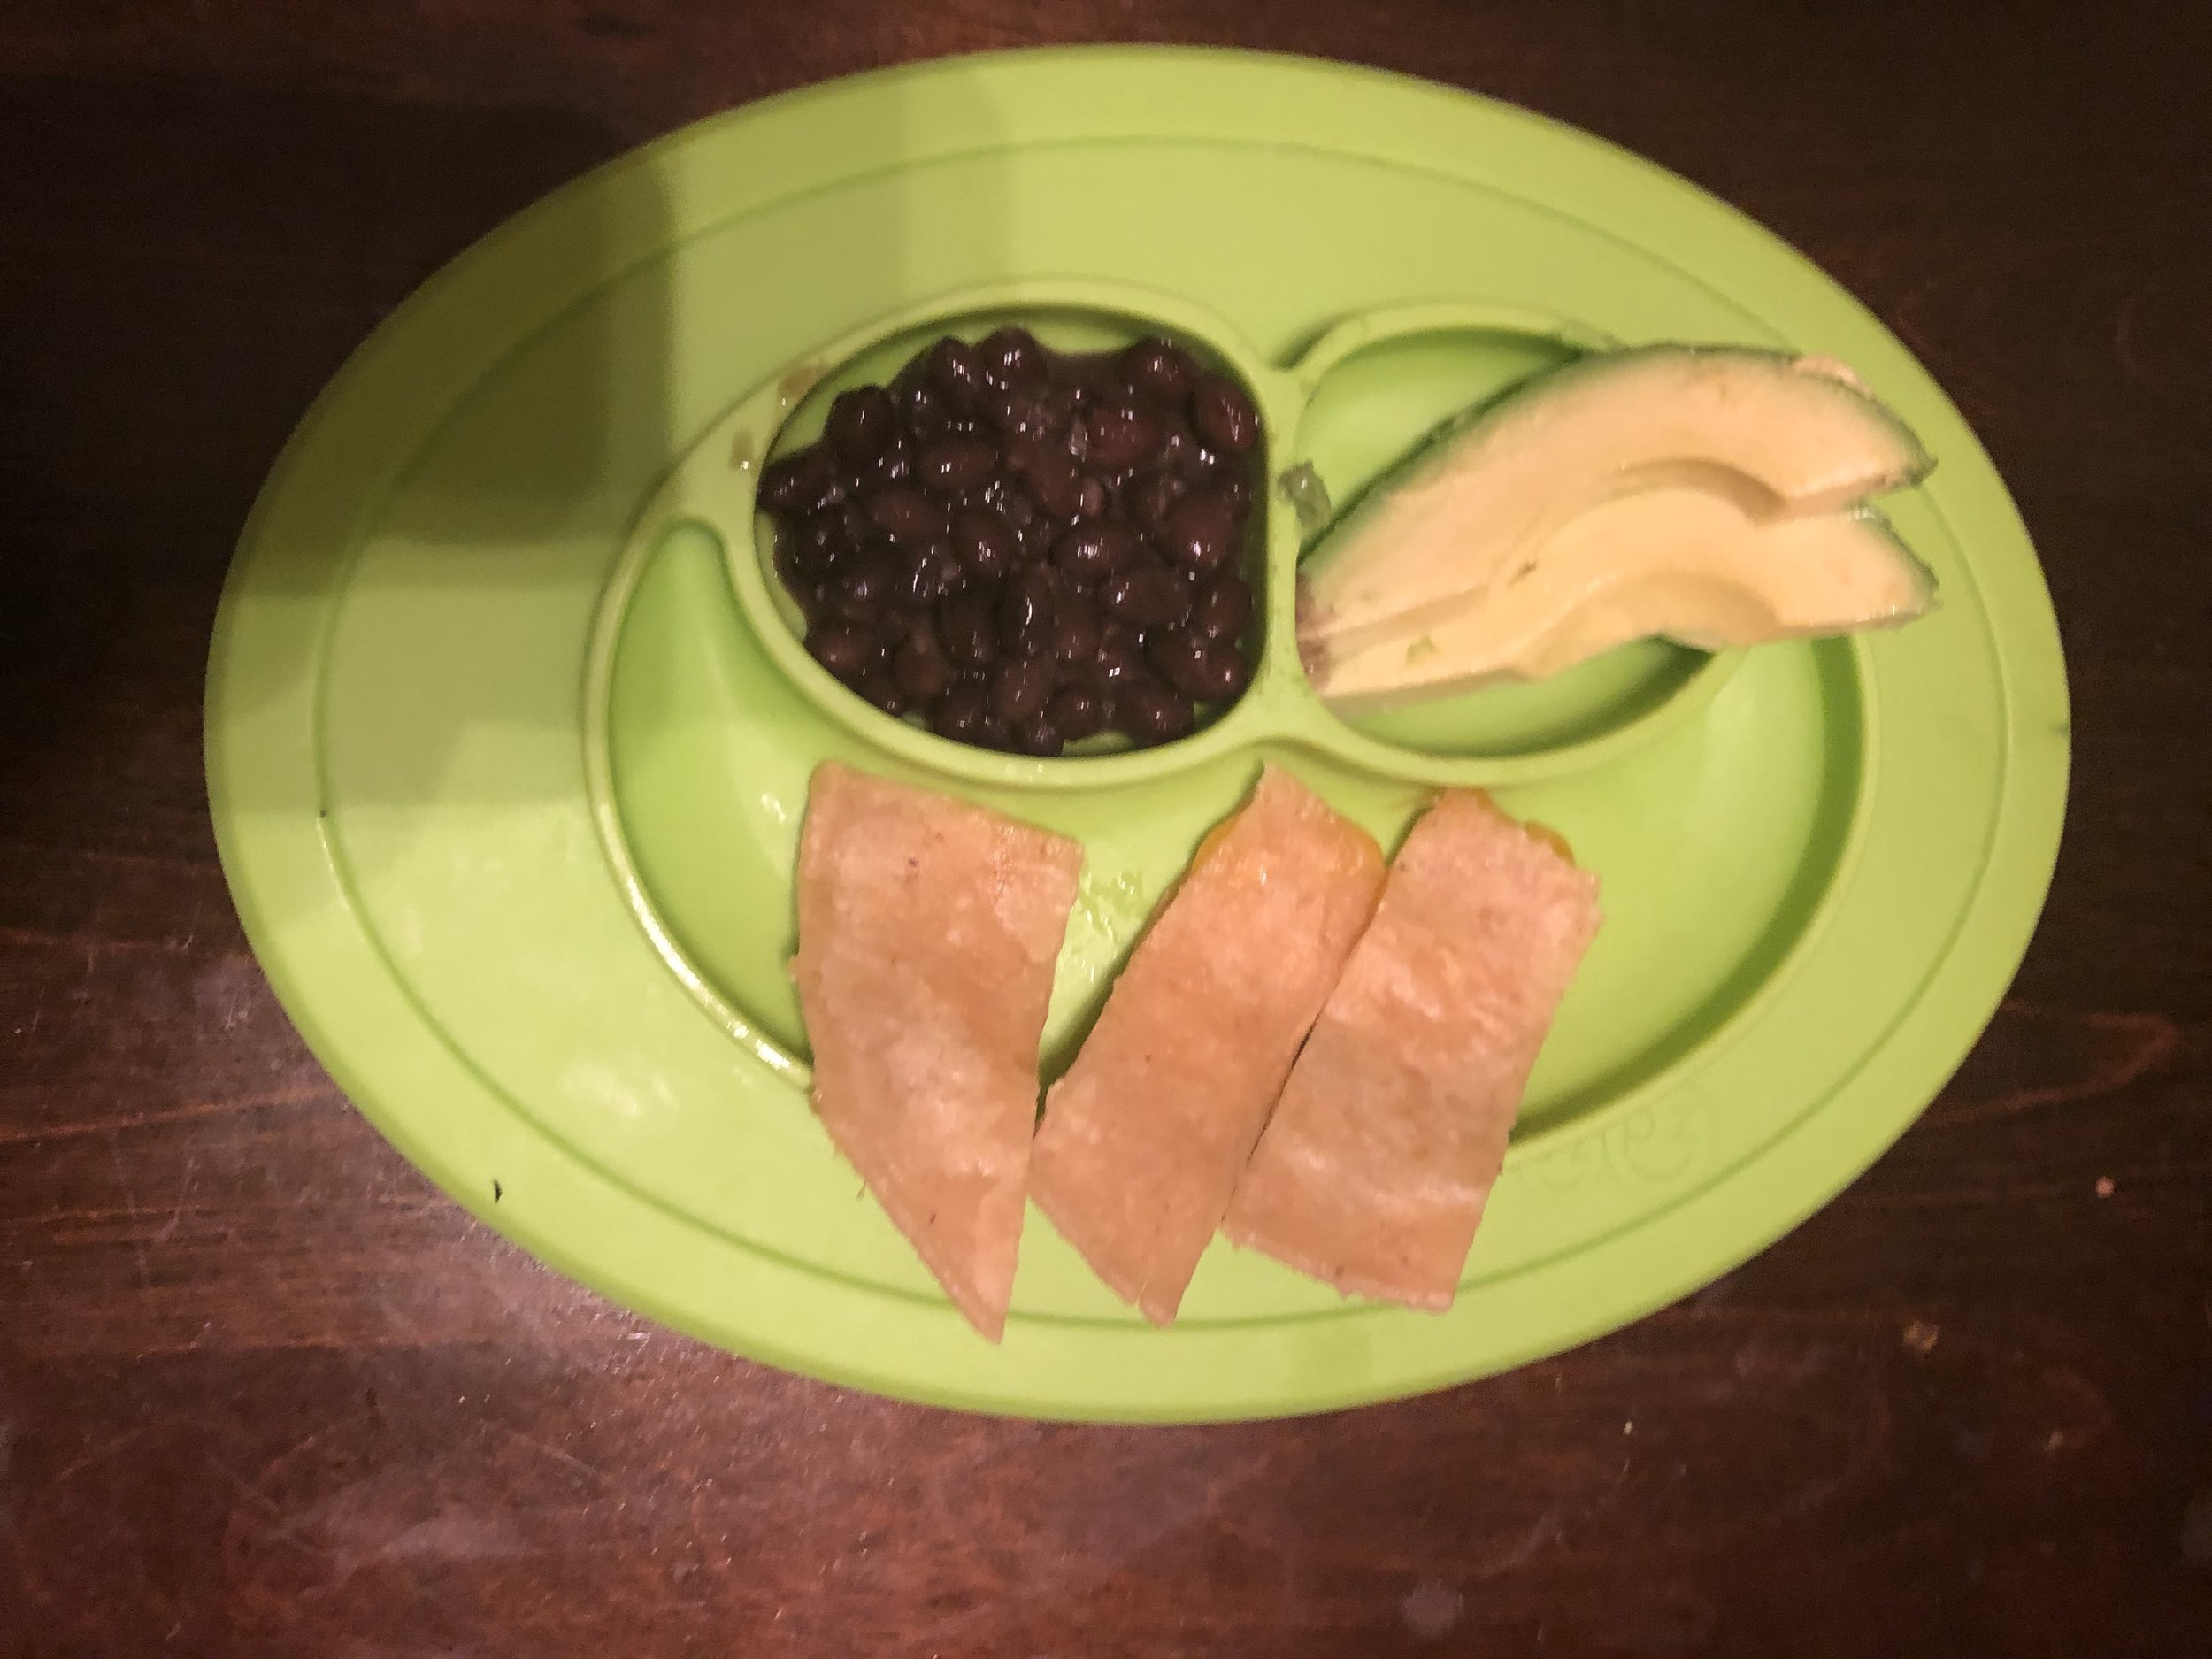 quesadillas, beans and avocado